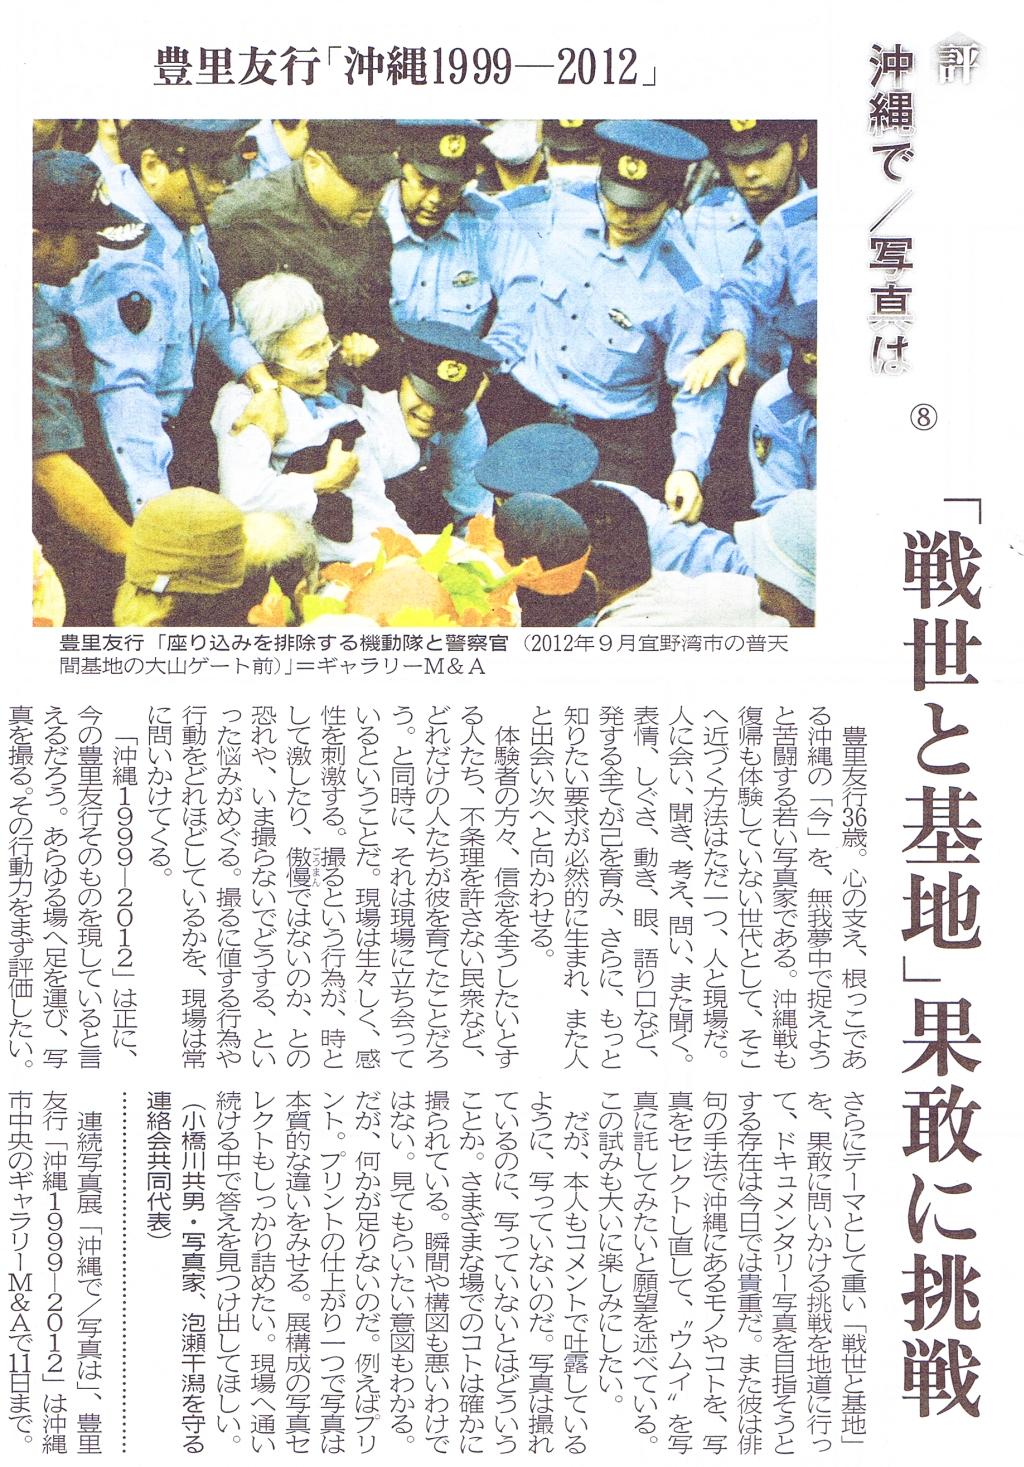 20121109_times_renzoku_toyozato.jpg